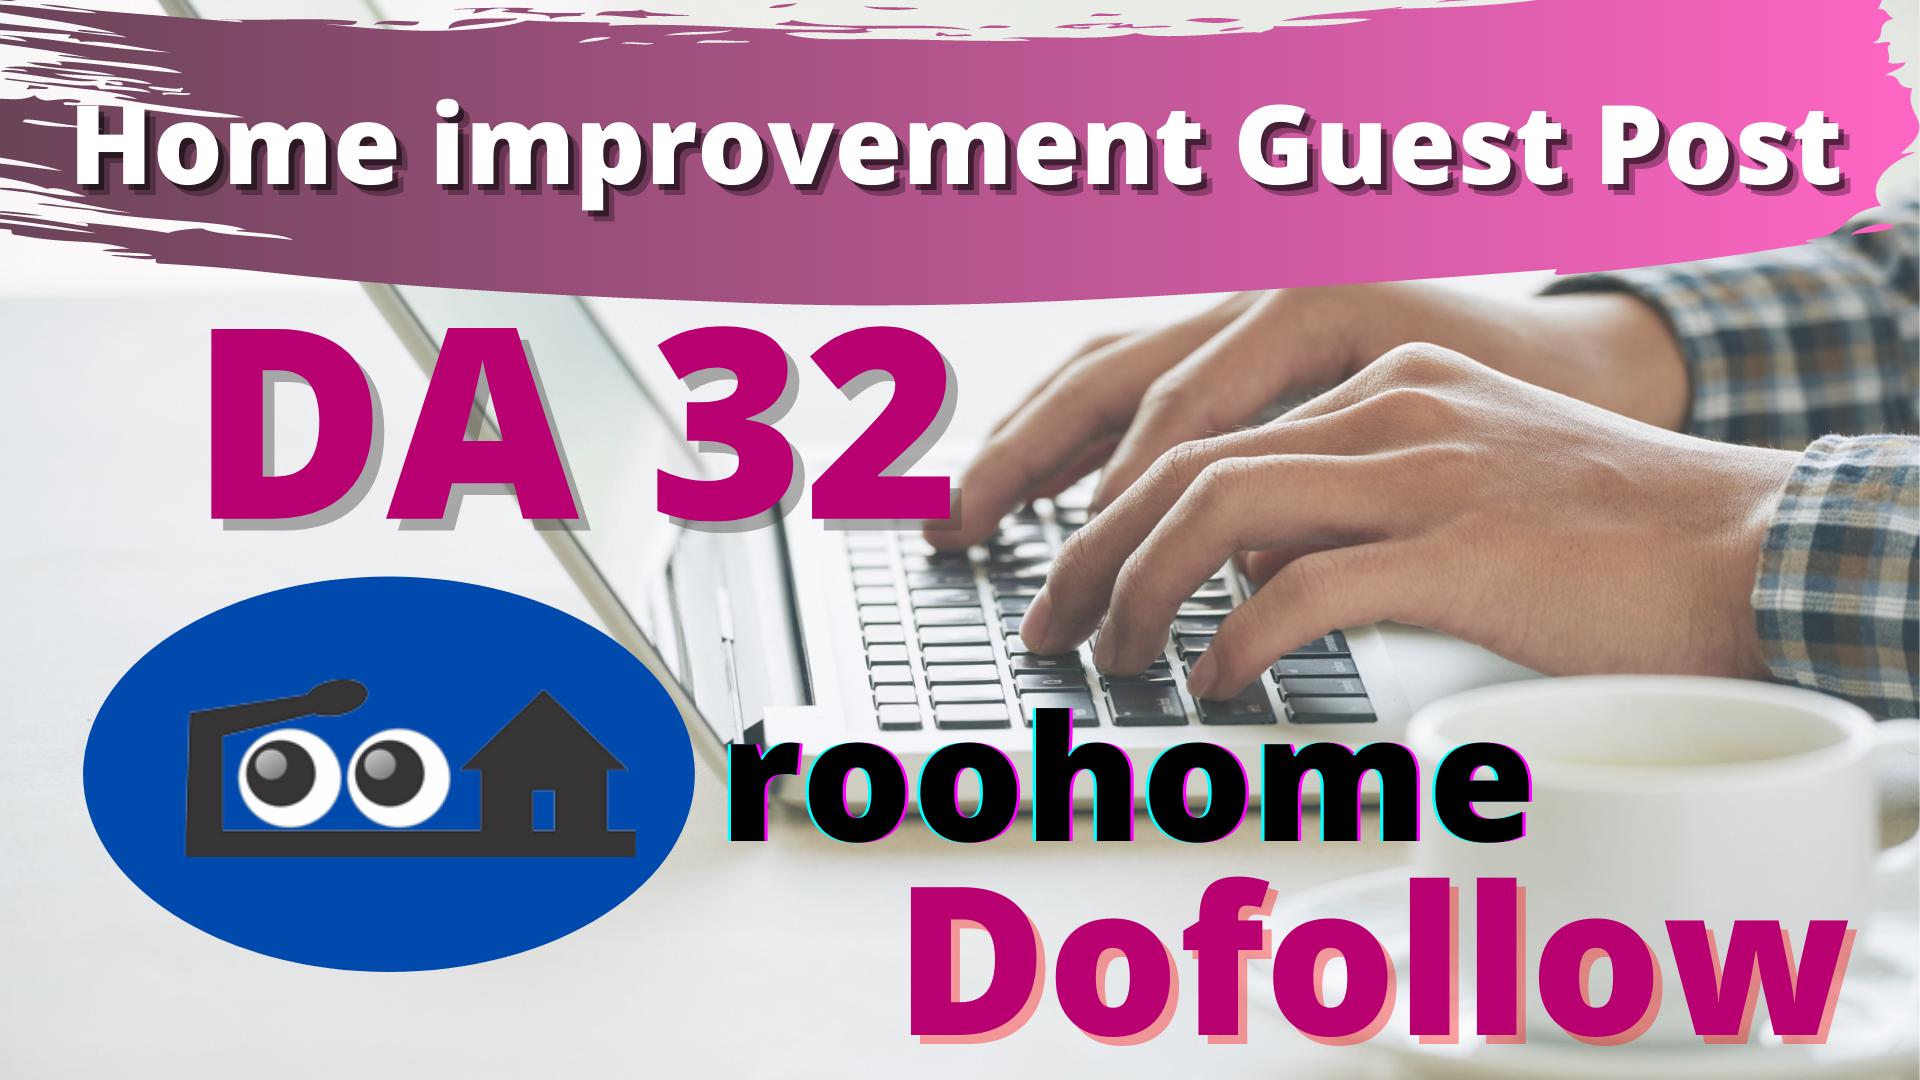 Guest Post on Home improvement website roohome. com DA 32